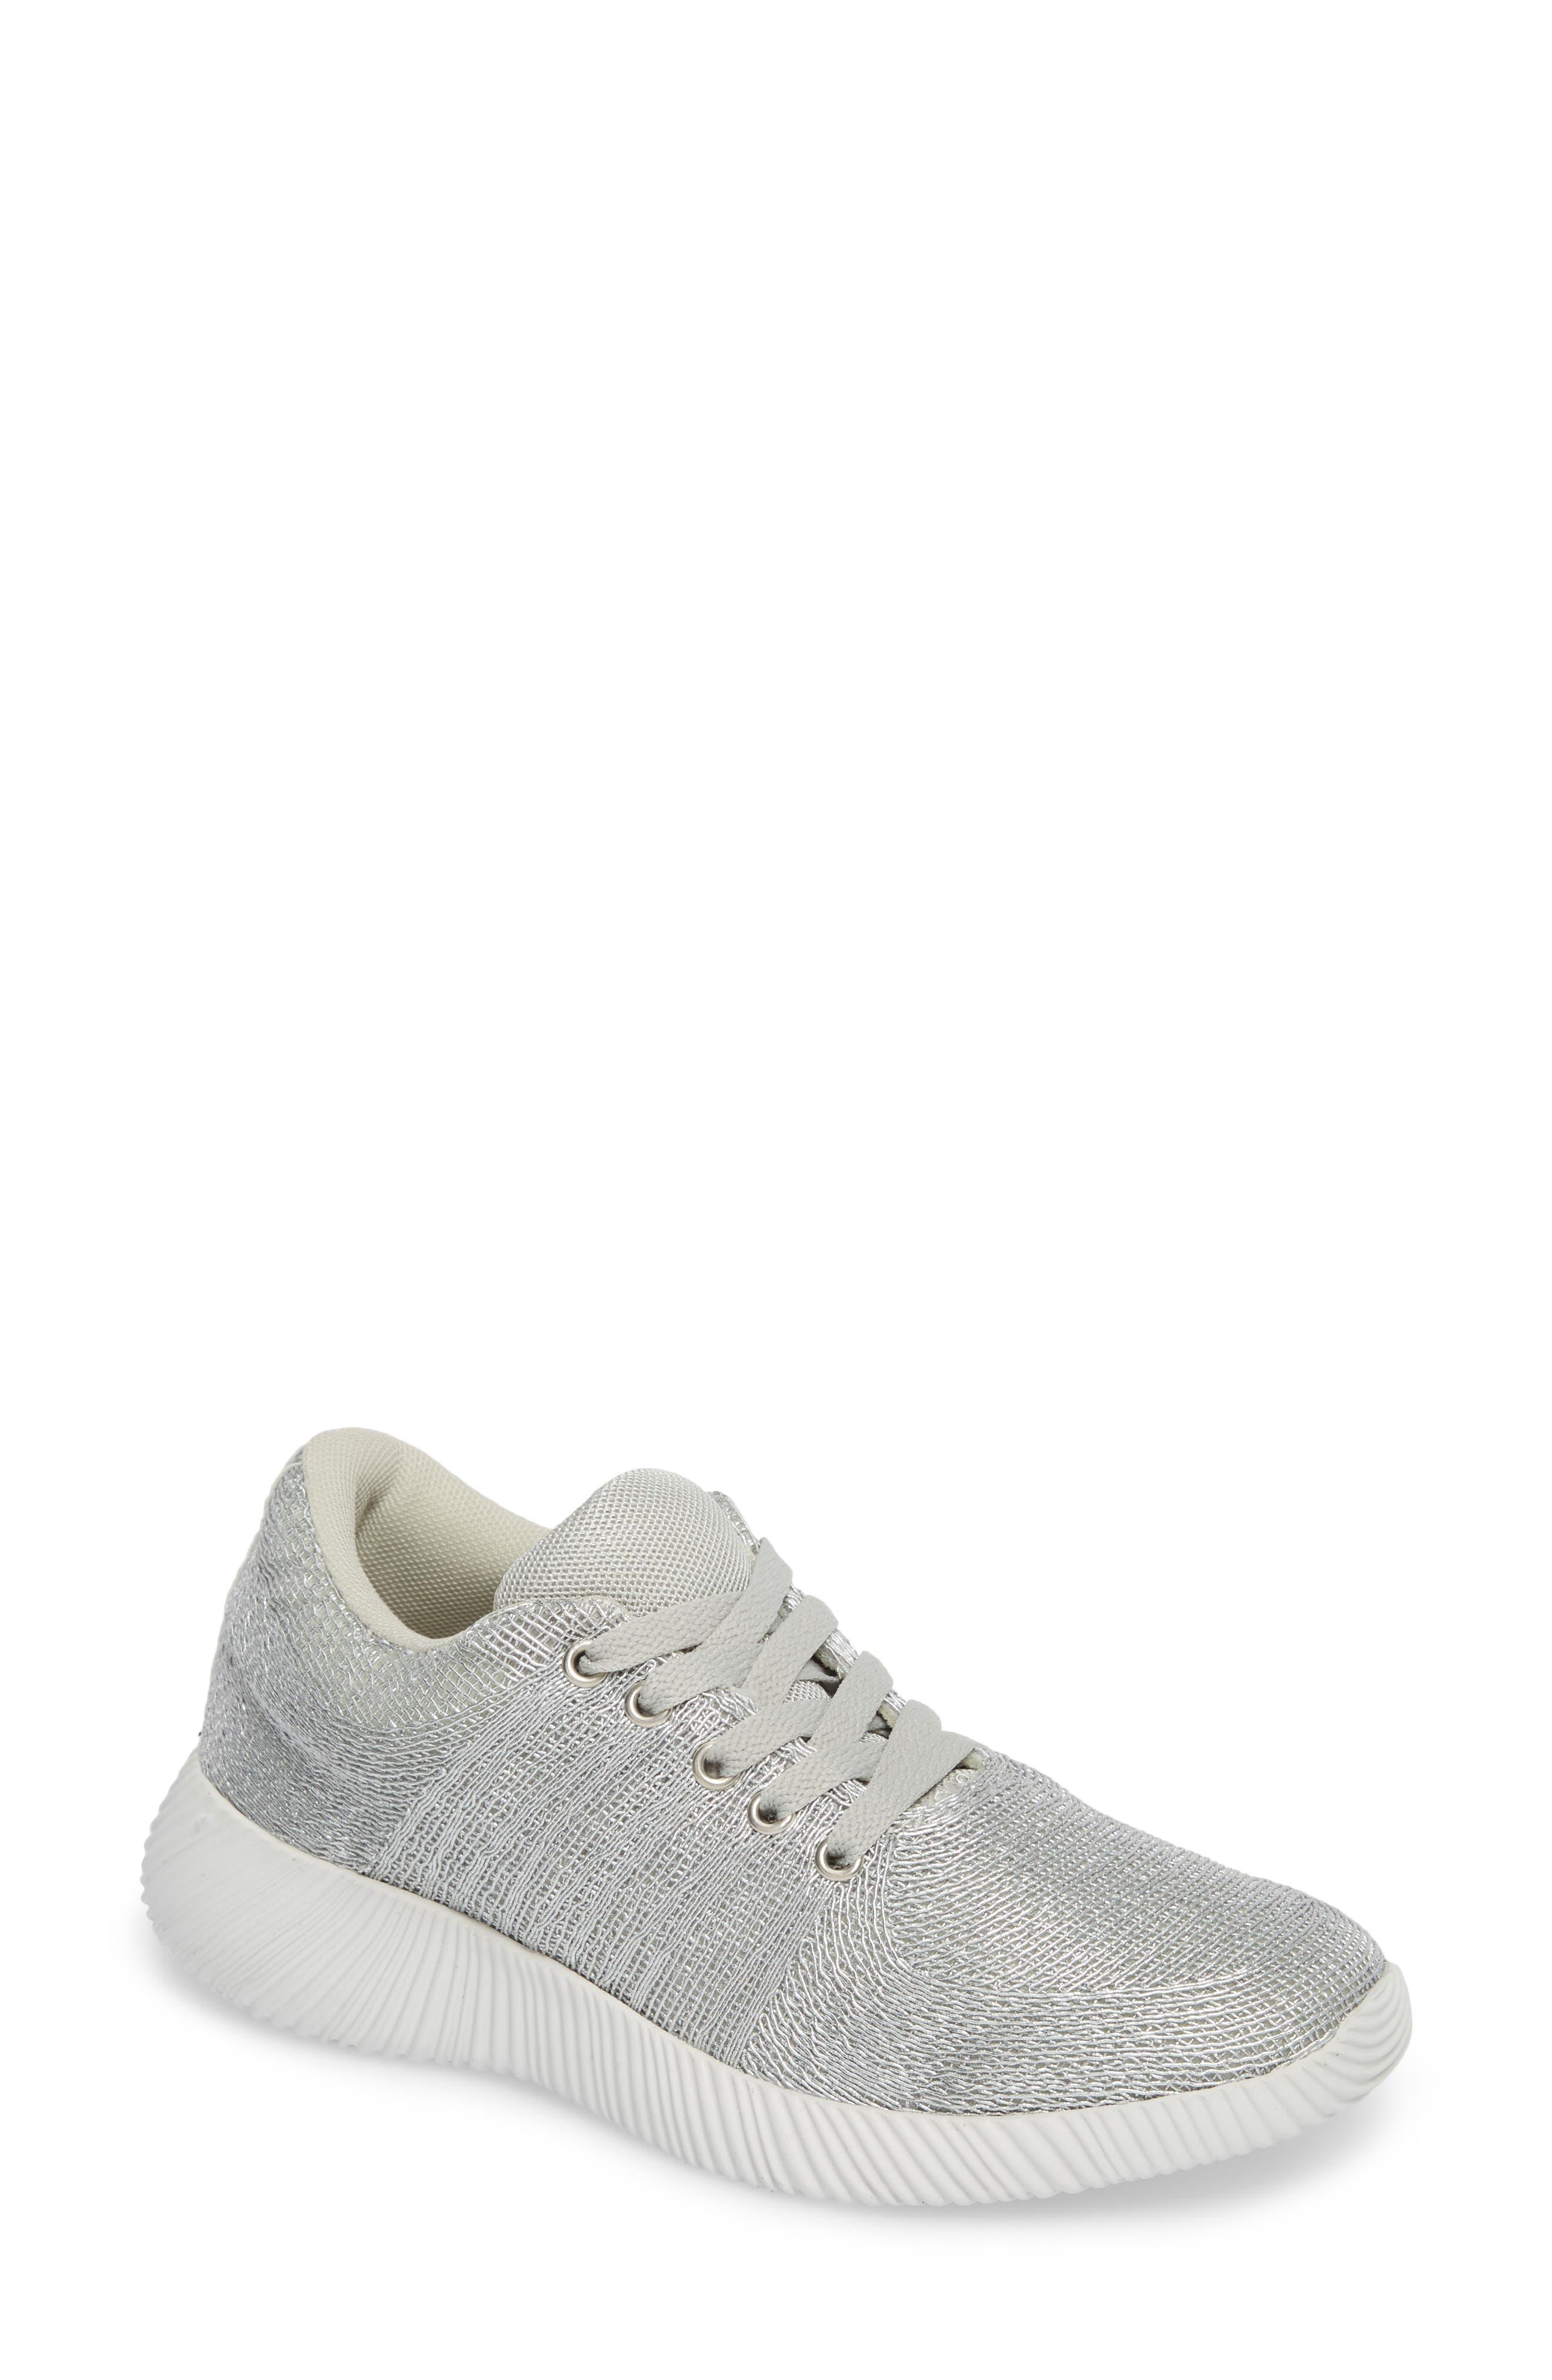 Amber Sneaker,                             Main thumbnail 1, color,                             040